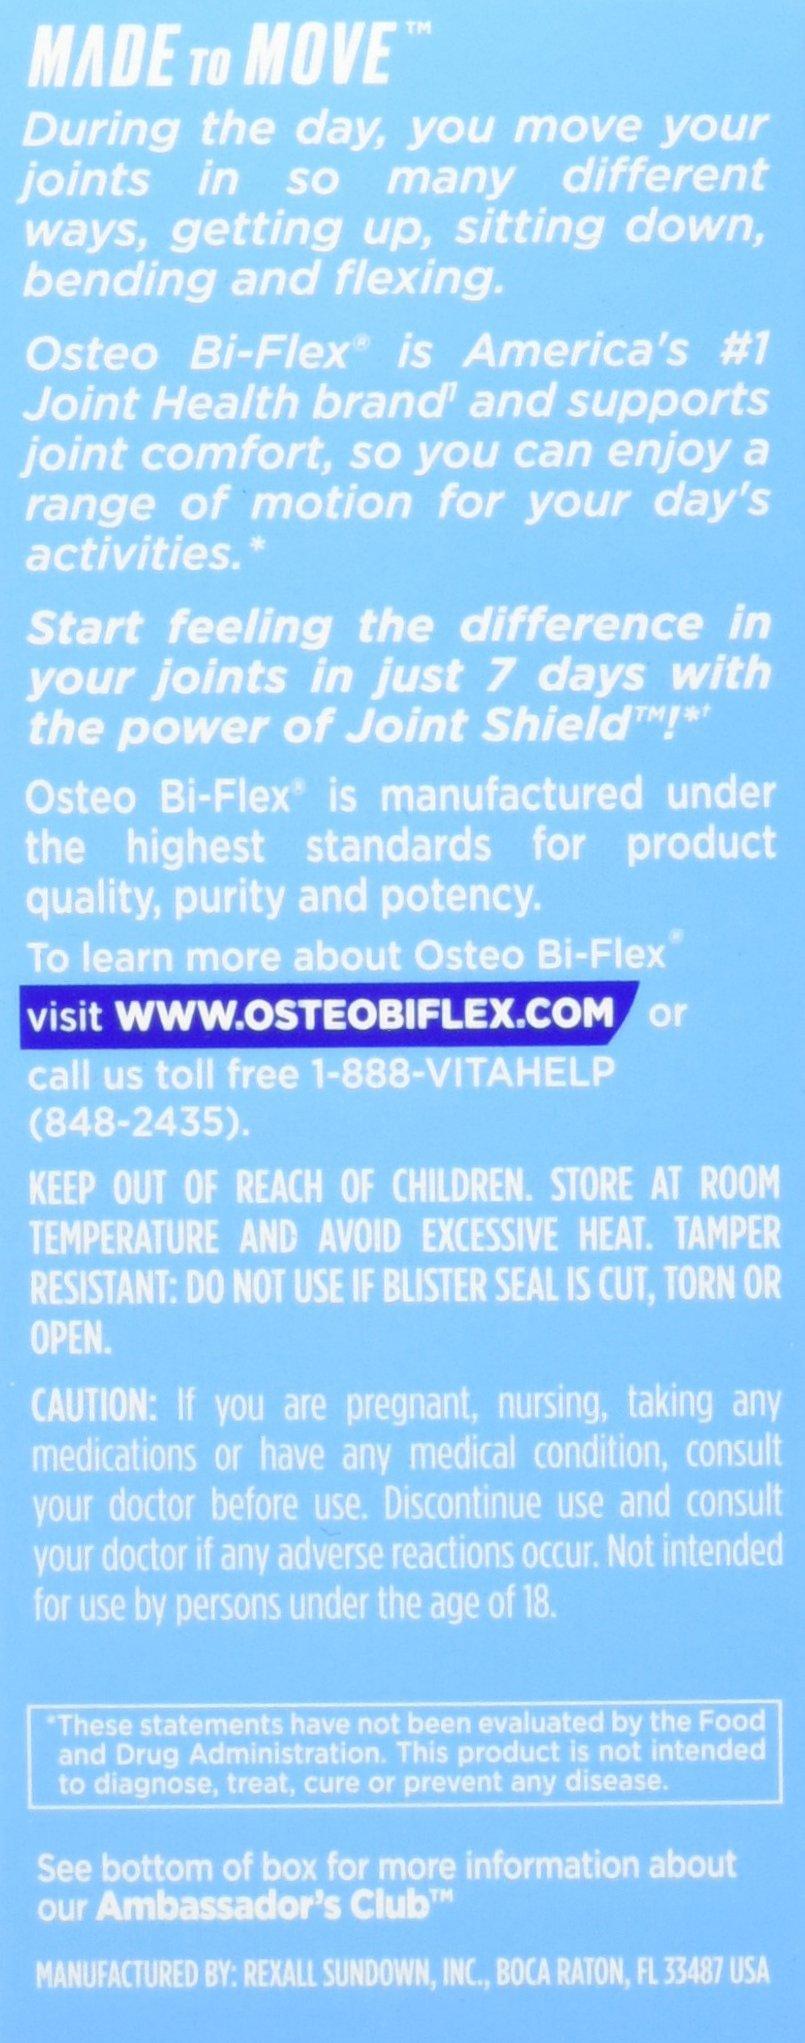 Osteo Bi Flex Joint Health Ease 70 Mini Tabs 1 A Day Advanced Triple Uc Action Ii Collagen Formula B078qcjv7j Medications Household Tibs